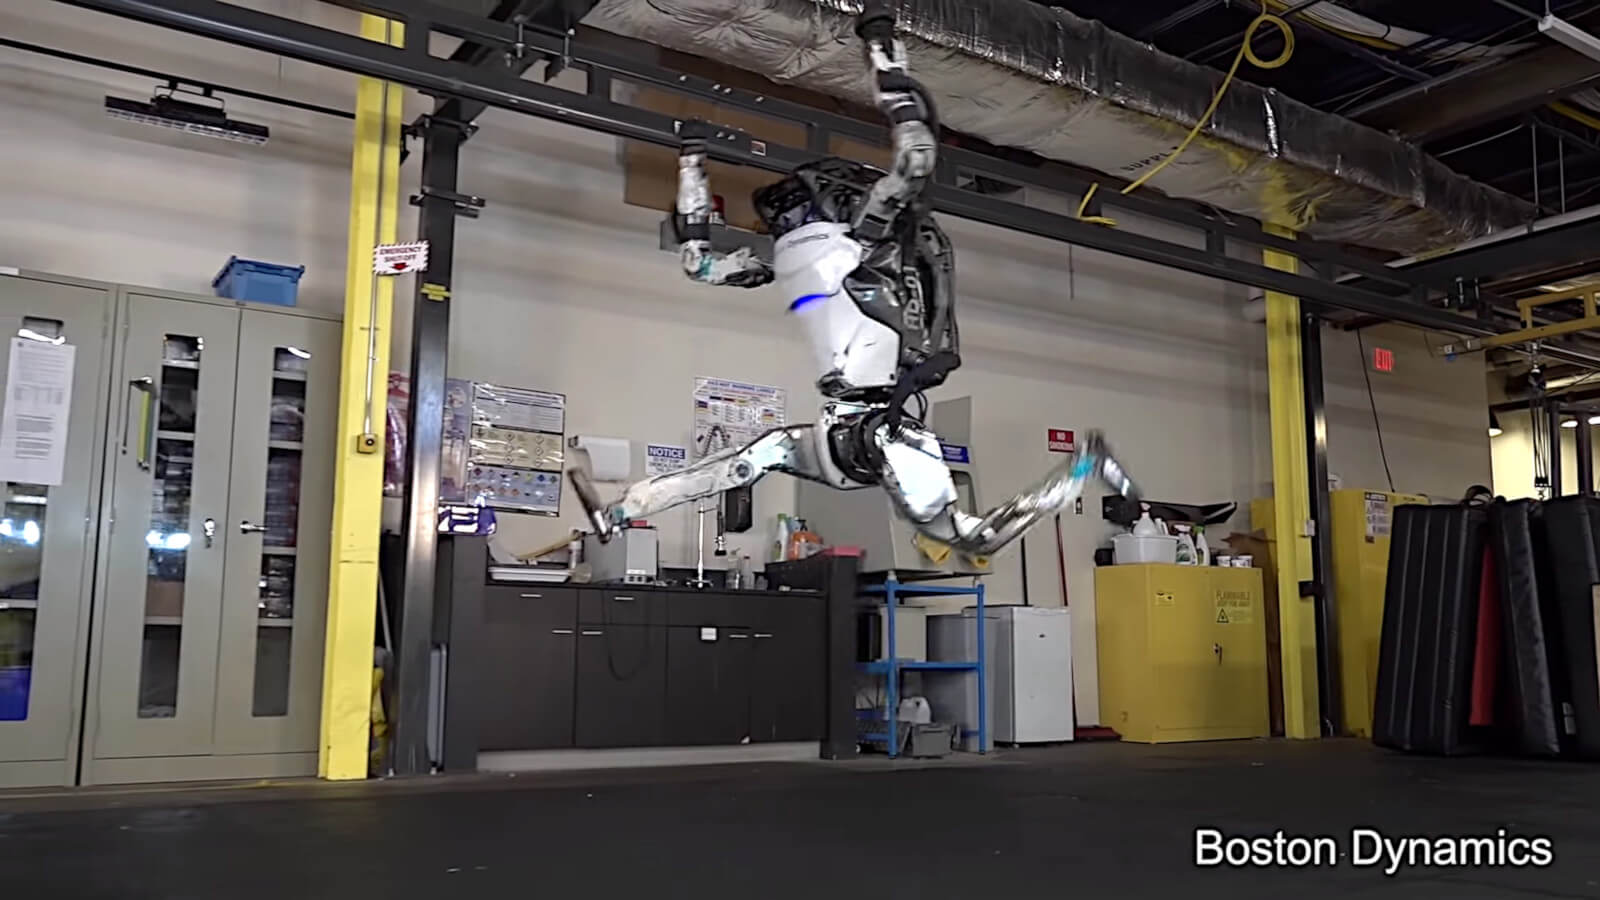 Boston Dynamics Atlas robot does a split in the air.